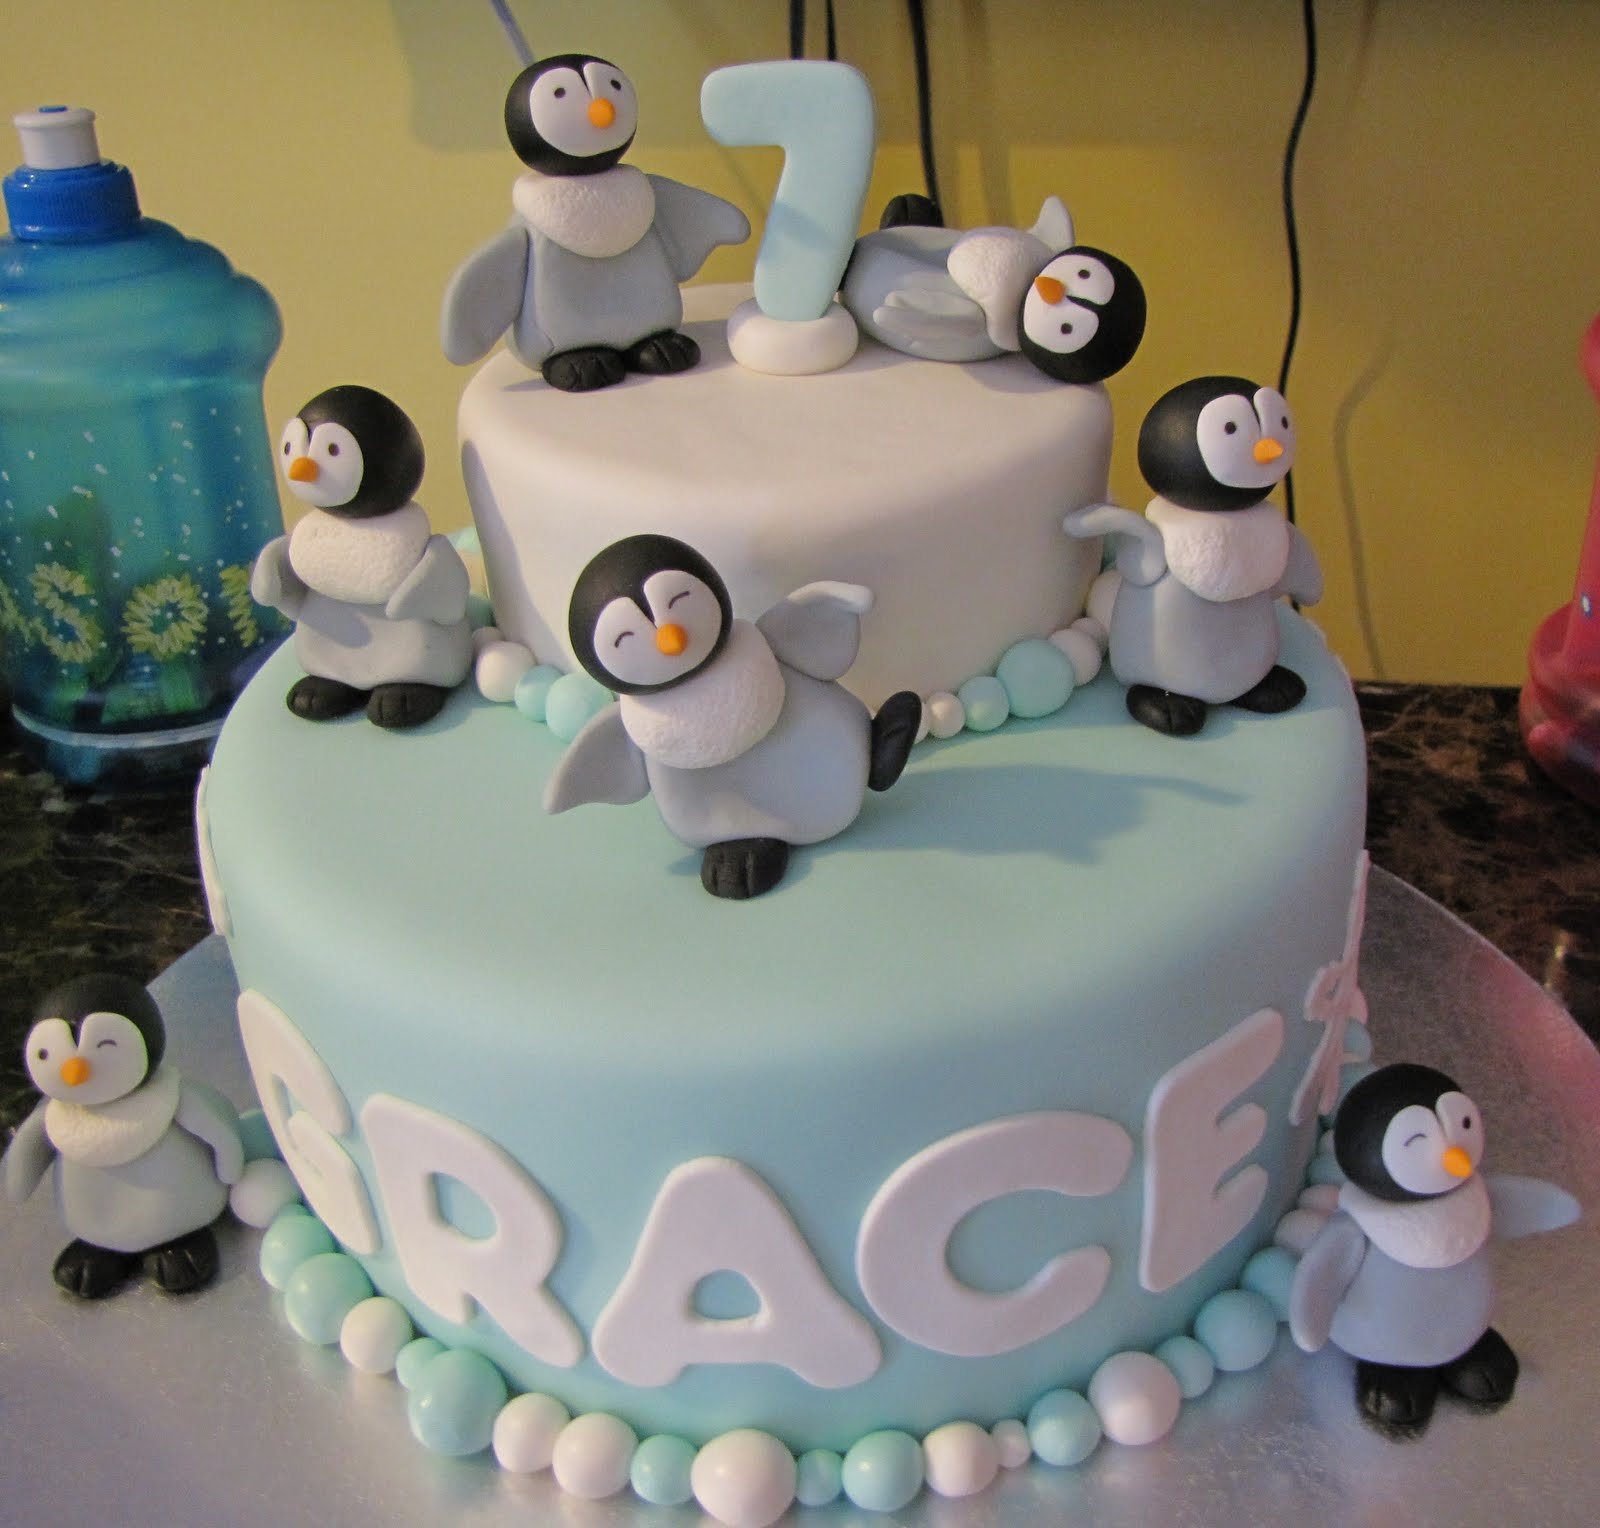 Penguin cake image by melkneec on Photobucket Wedding ...